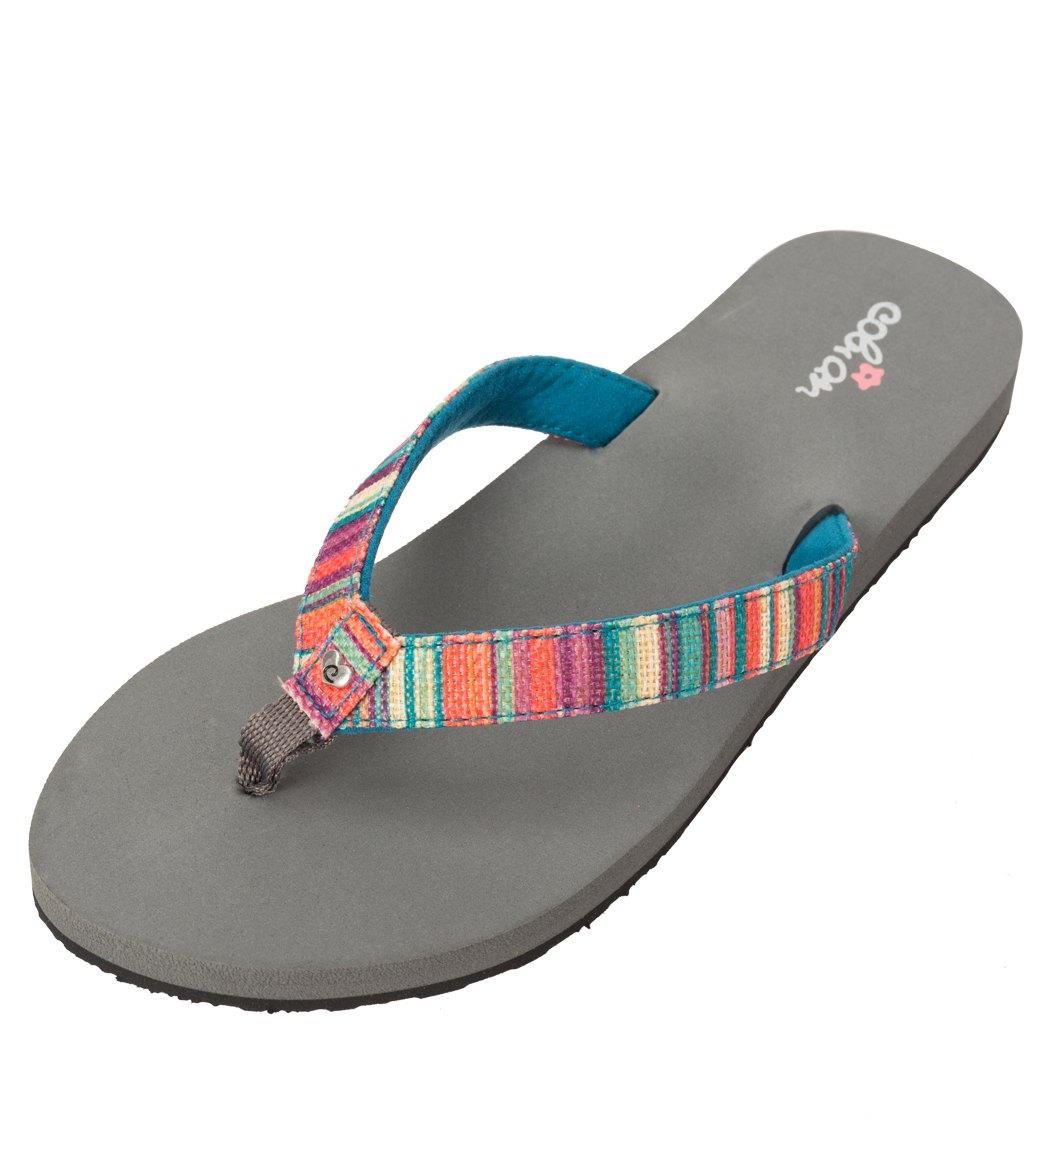 ddadebab8cec Cobian girls pinata flip flop jpg 1044x1176 Cobian flip flops